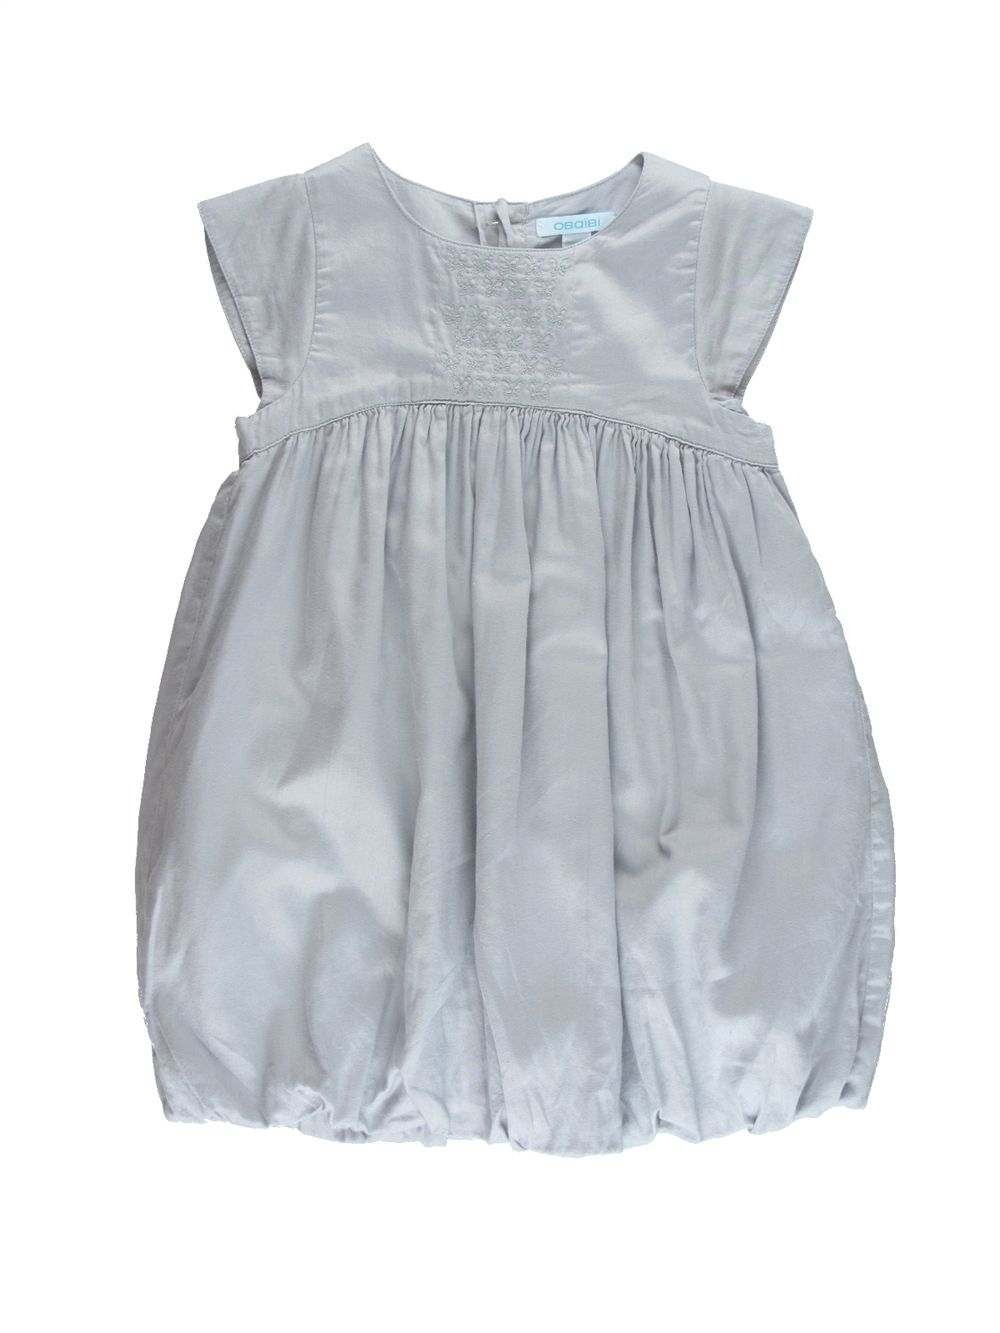 Robe fille 2 ans pas cher